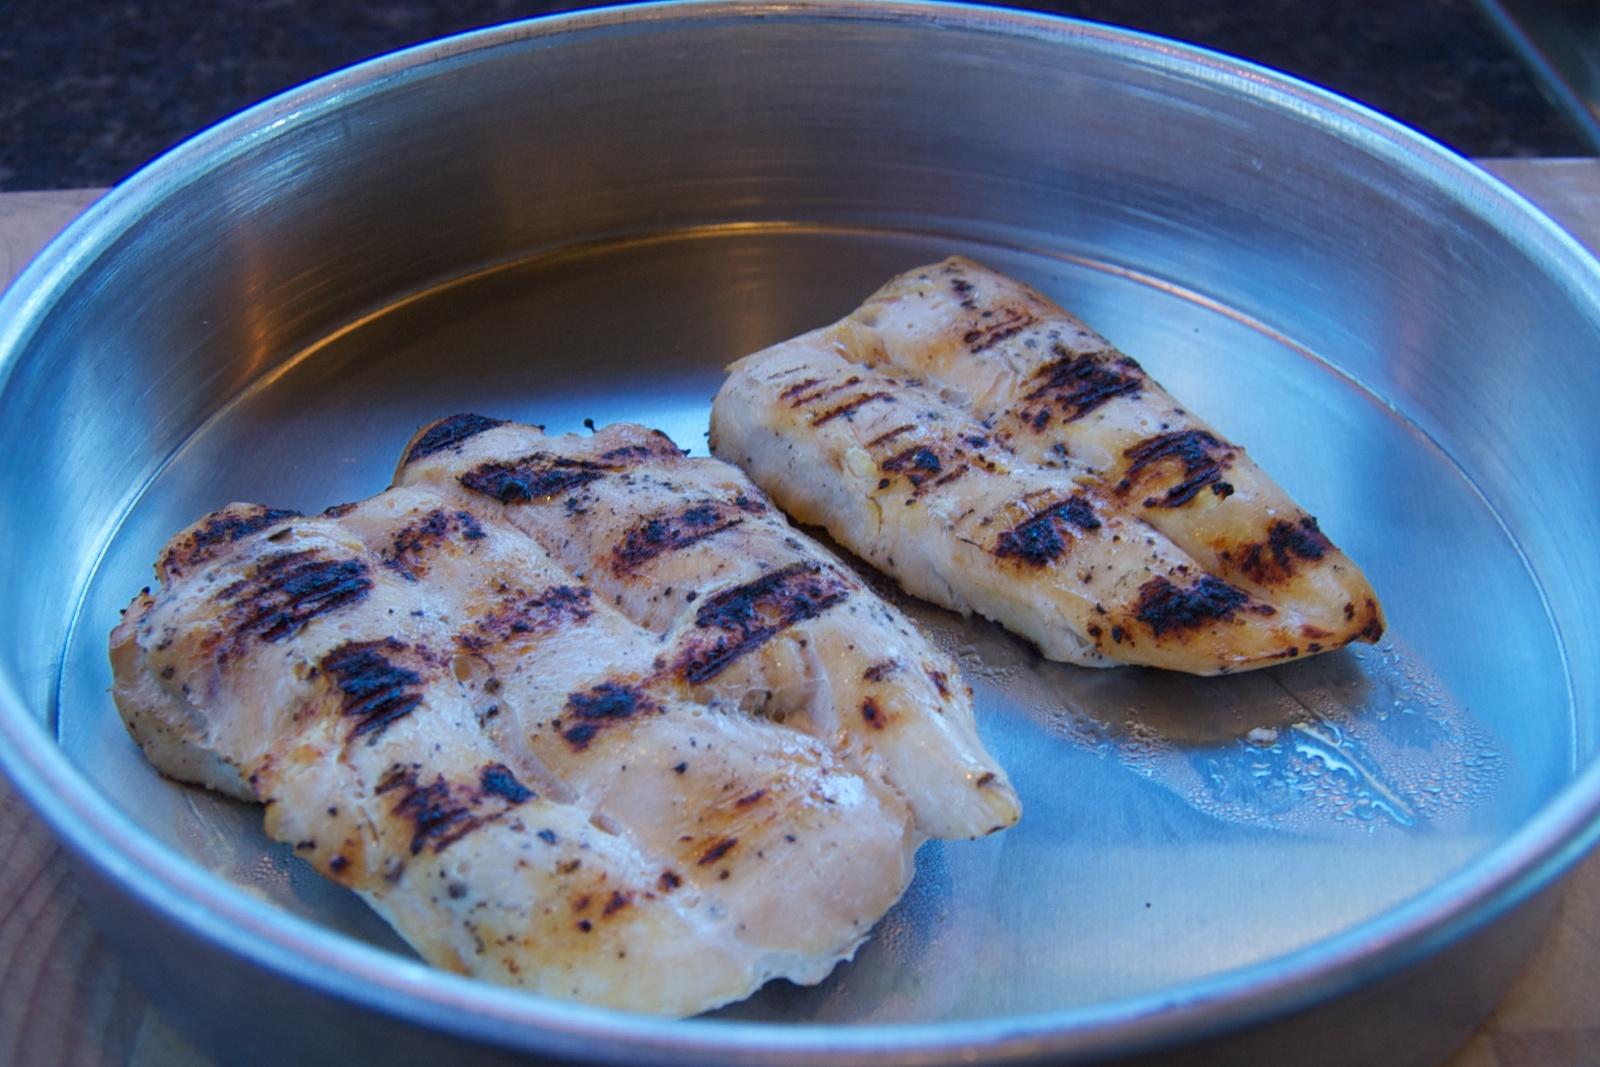 http://blog.rickk.com/food/2012/03/20/ate.2012.03.20.c3.jpg